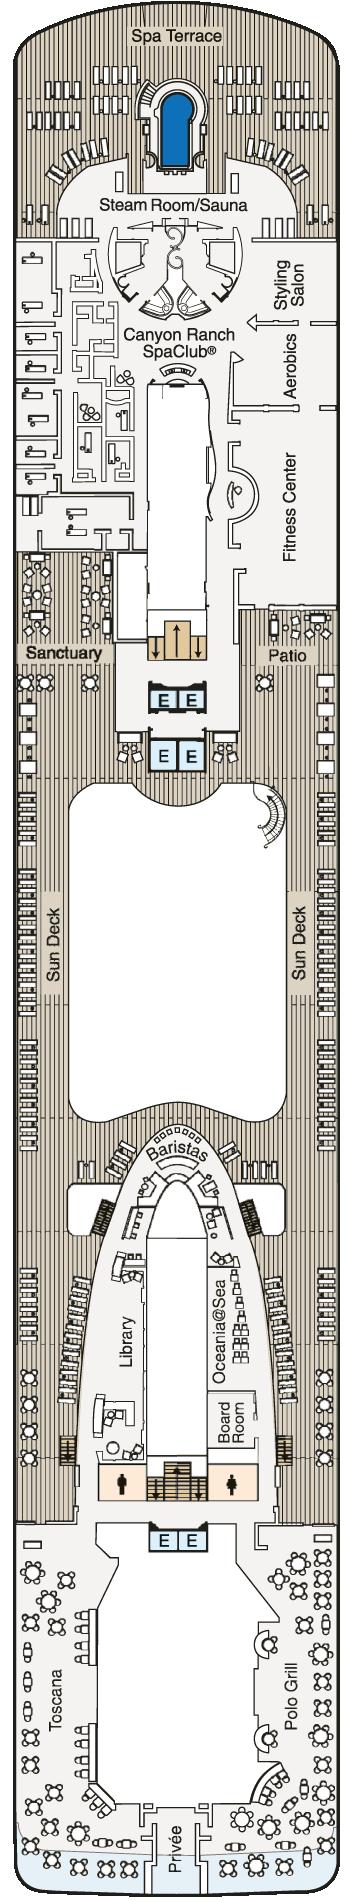 MS Marina - Deck 14